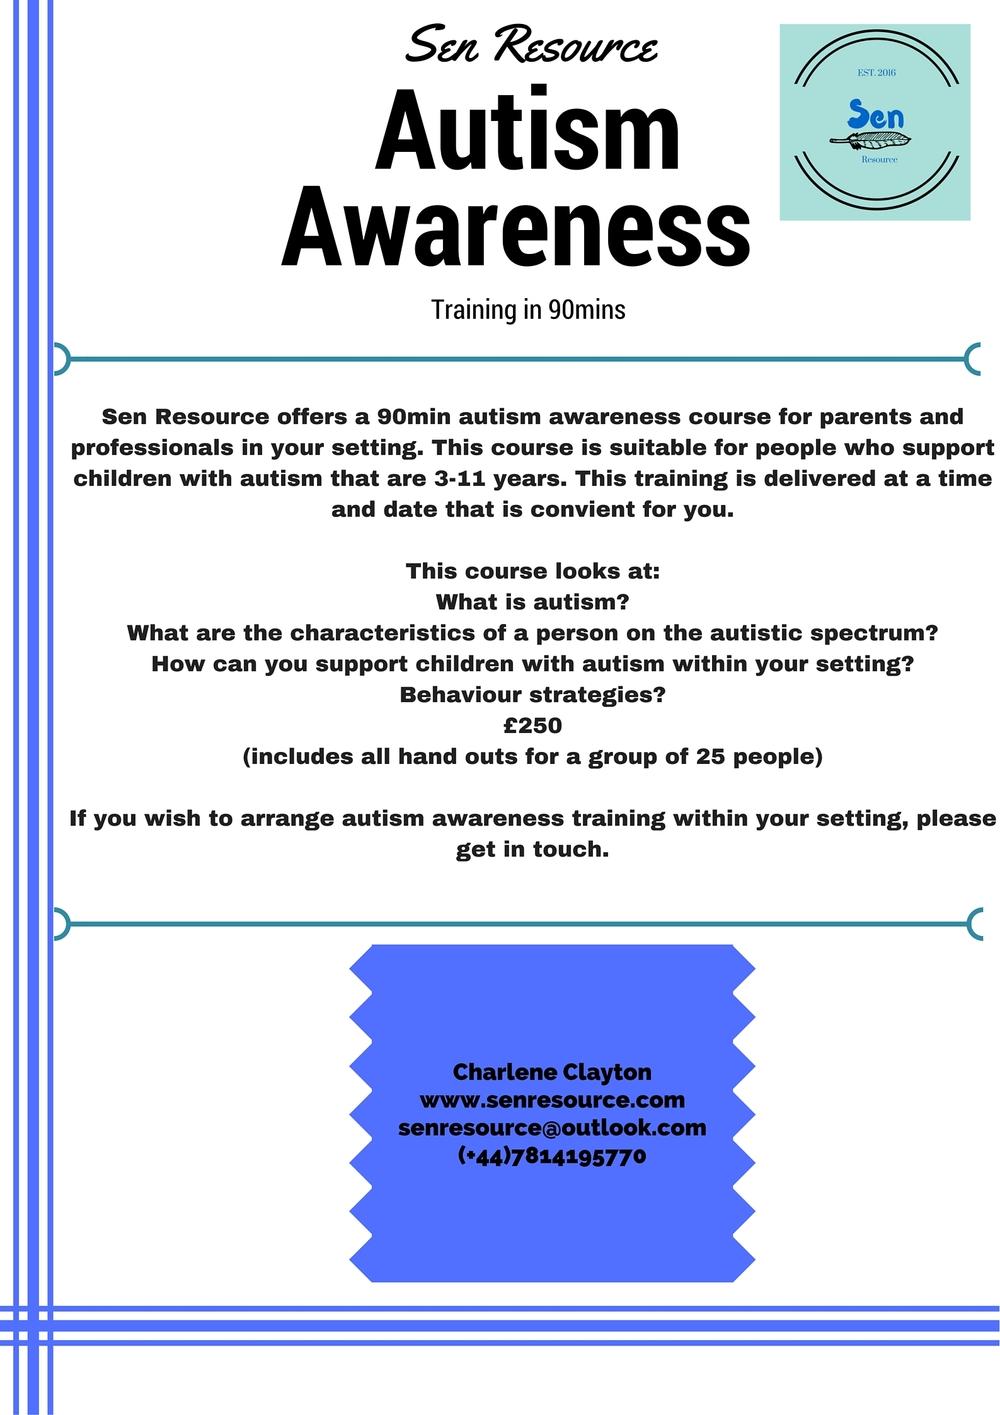 Sen Resource training autism awareness